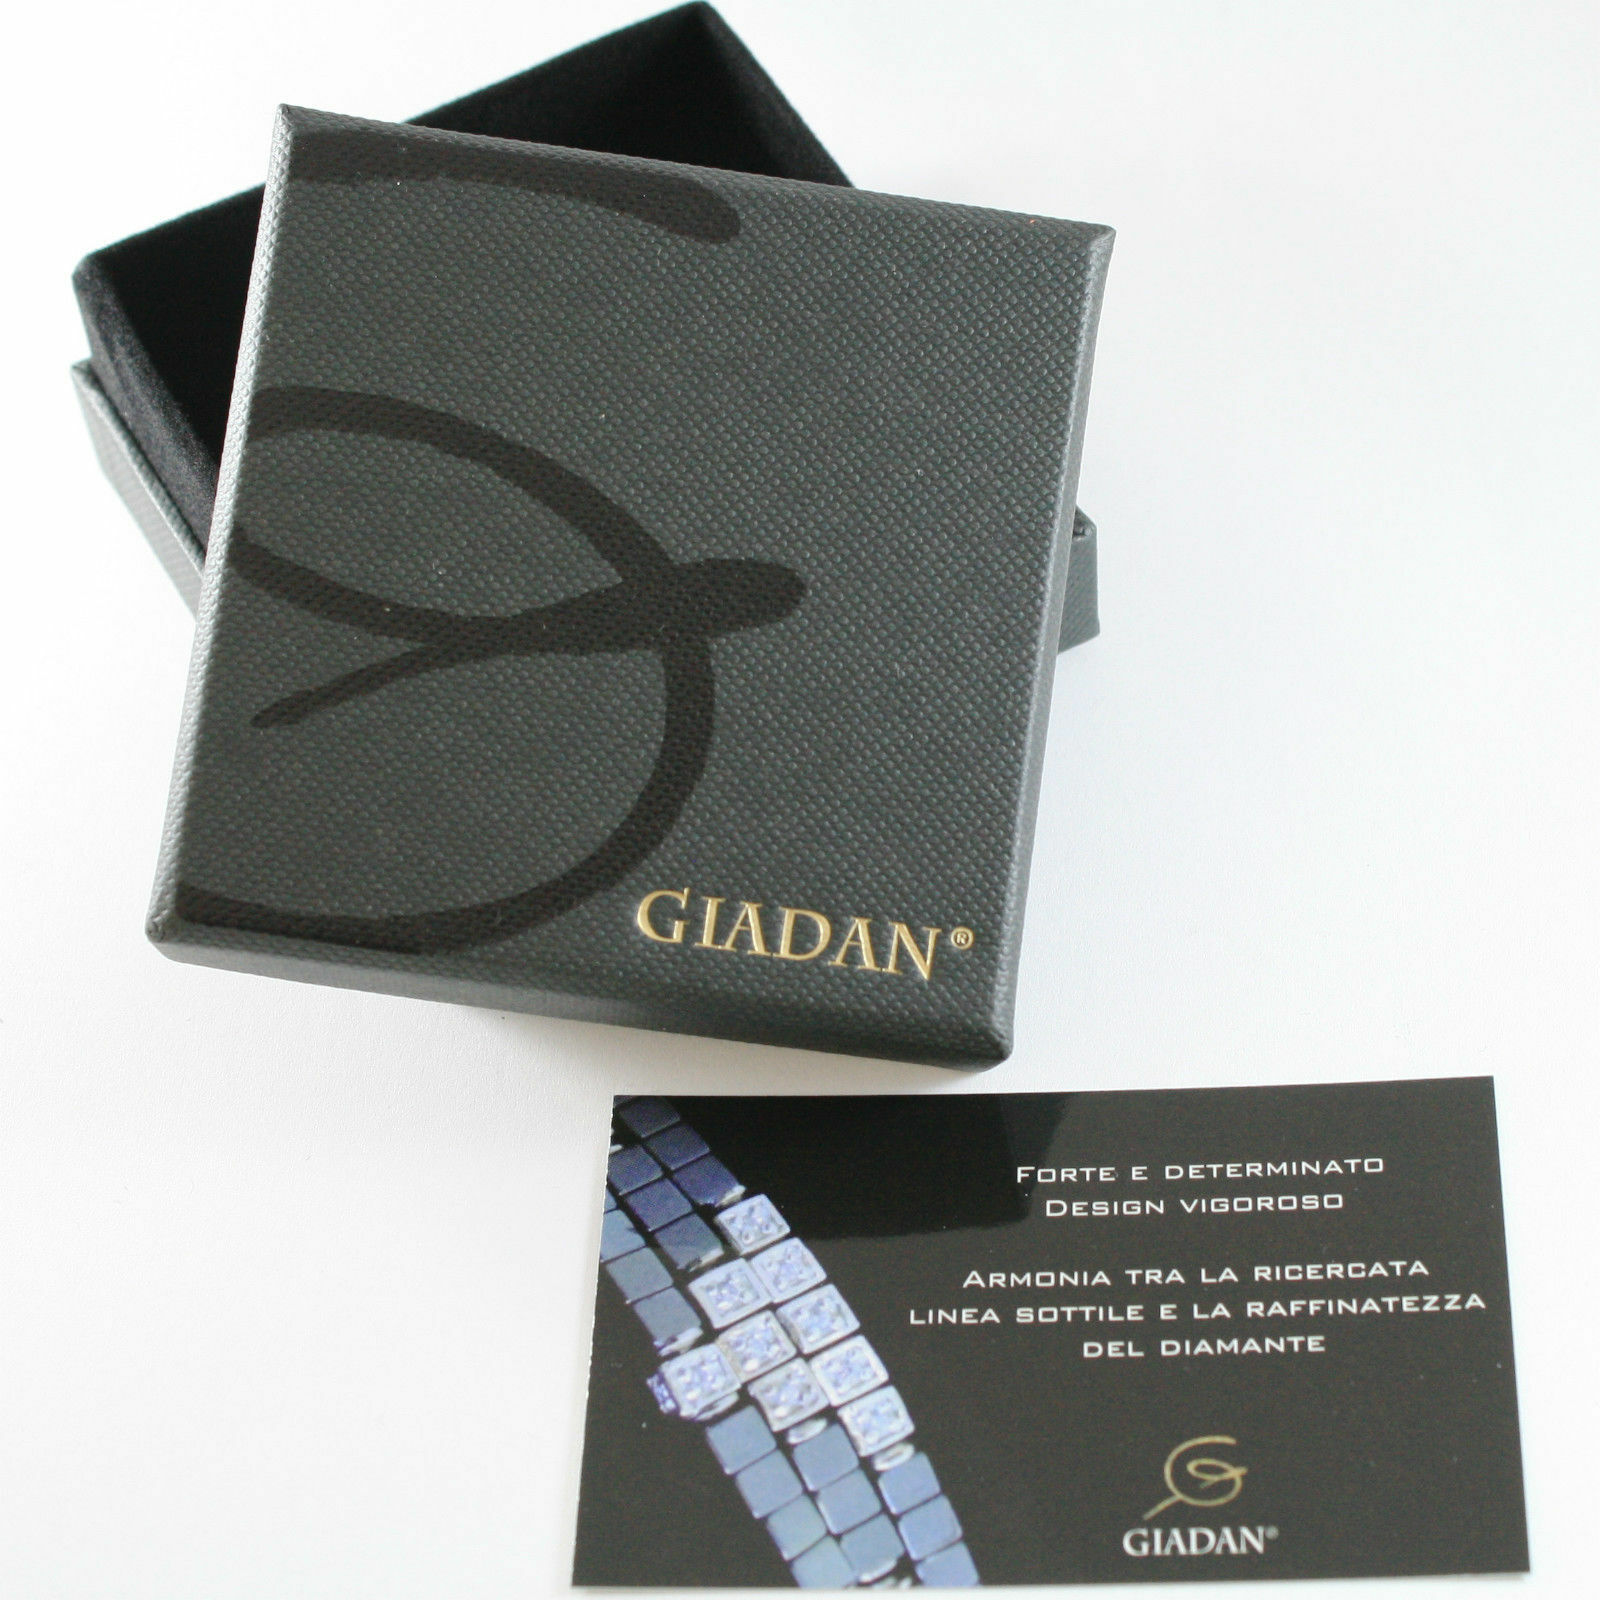 Bracelet Giadan 925 Silver with Hematite Polished Diamond & Black Made in Italy